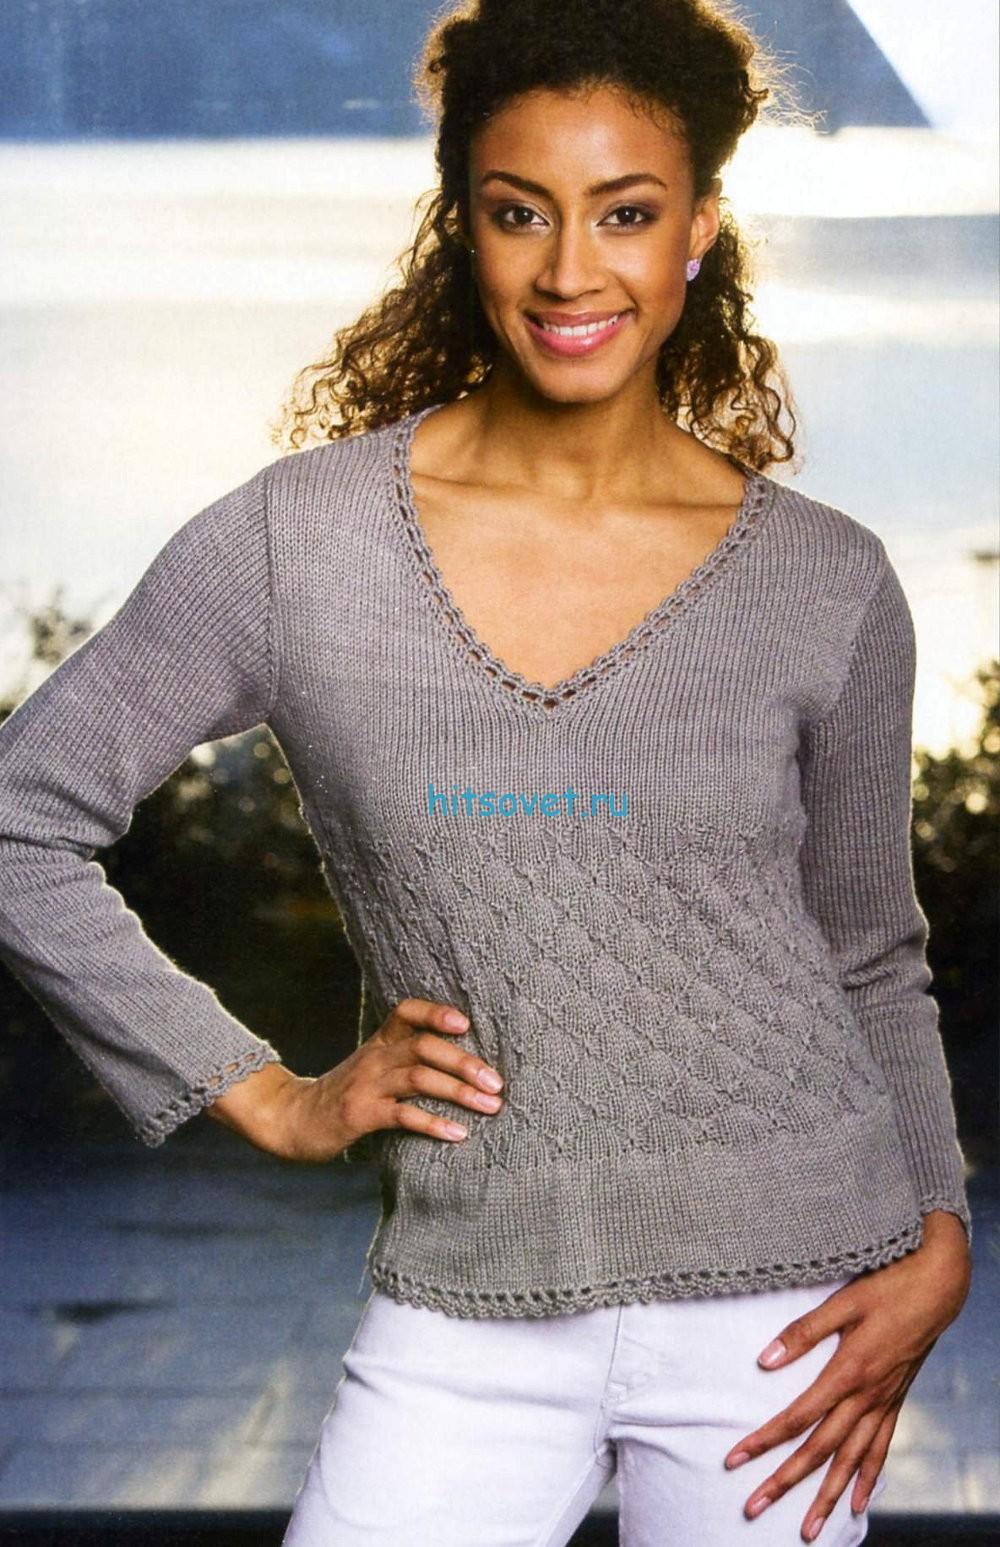 Серый вязаный пуловер, фото 2.